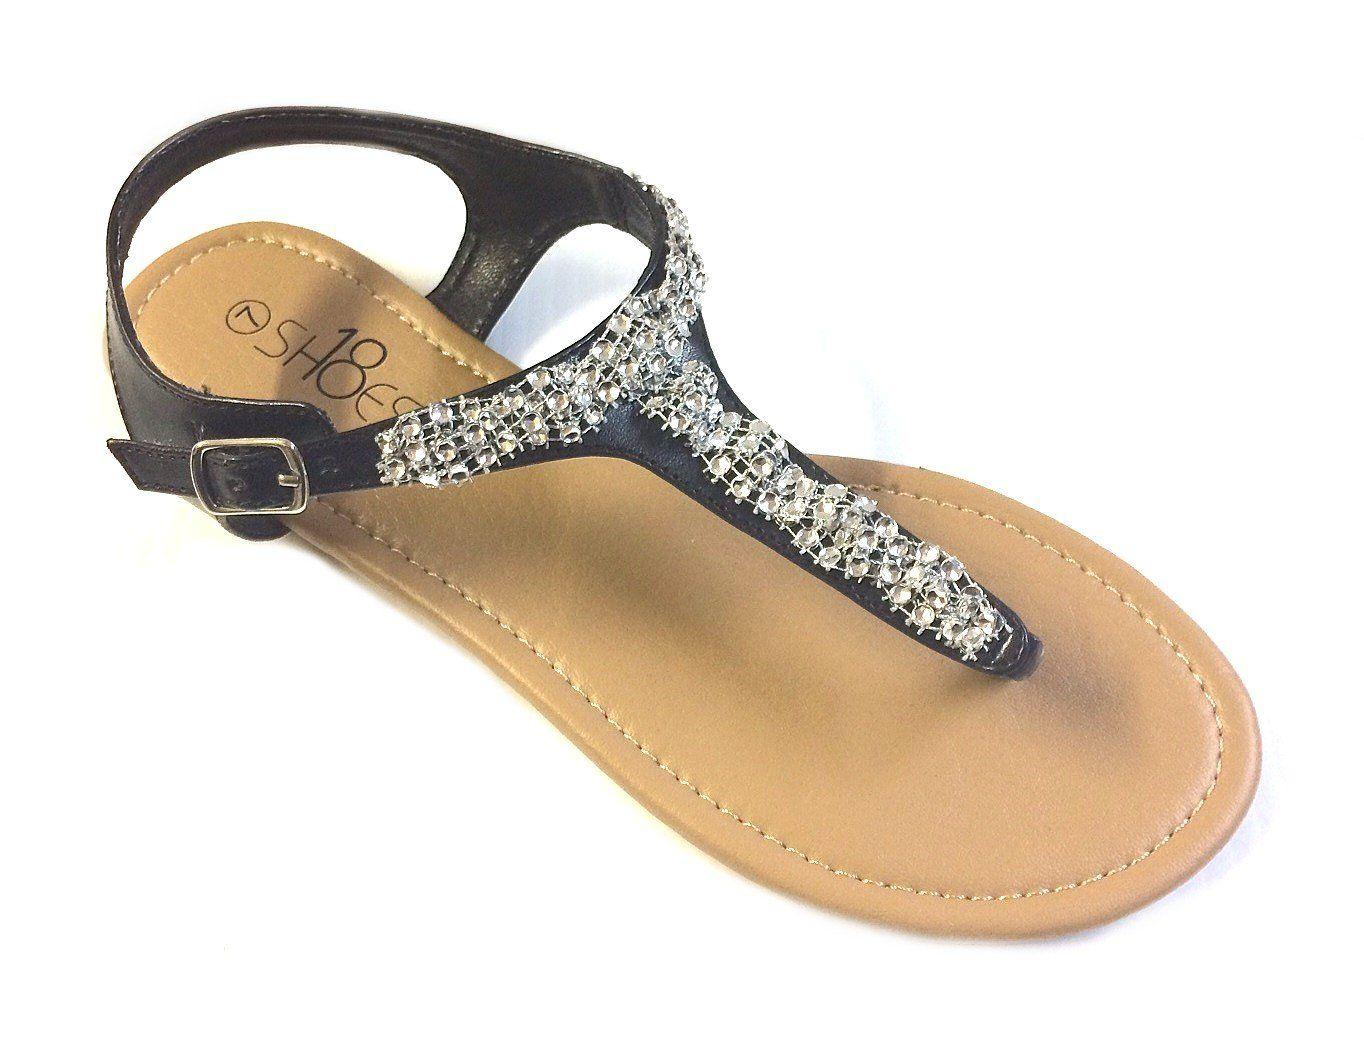 051e2fd3b Womens T Strap Gladiator Sandals Flats shoes W Iridescent Rhinestones (6